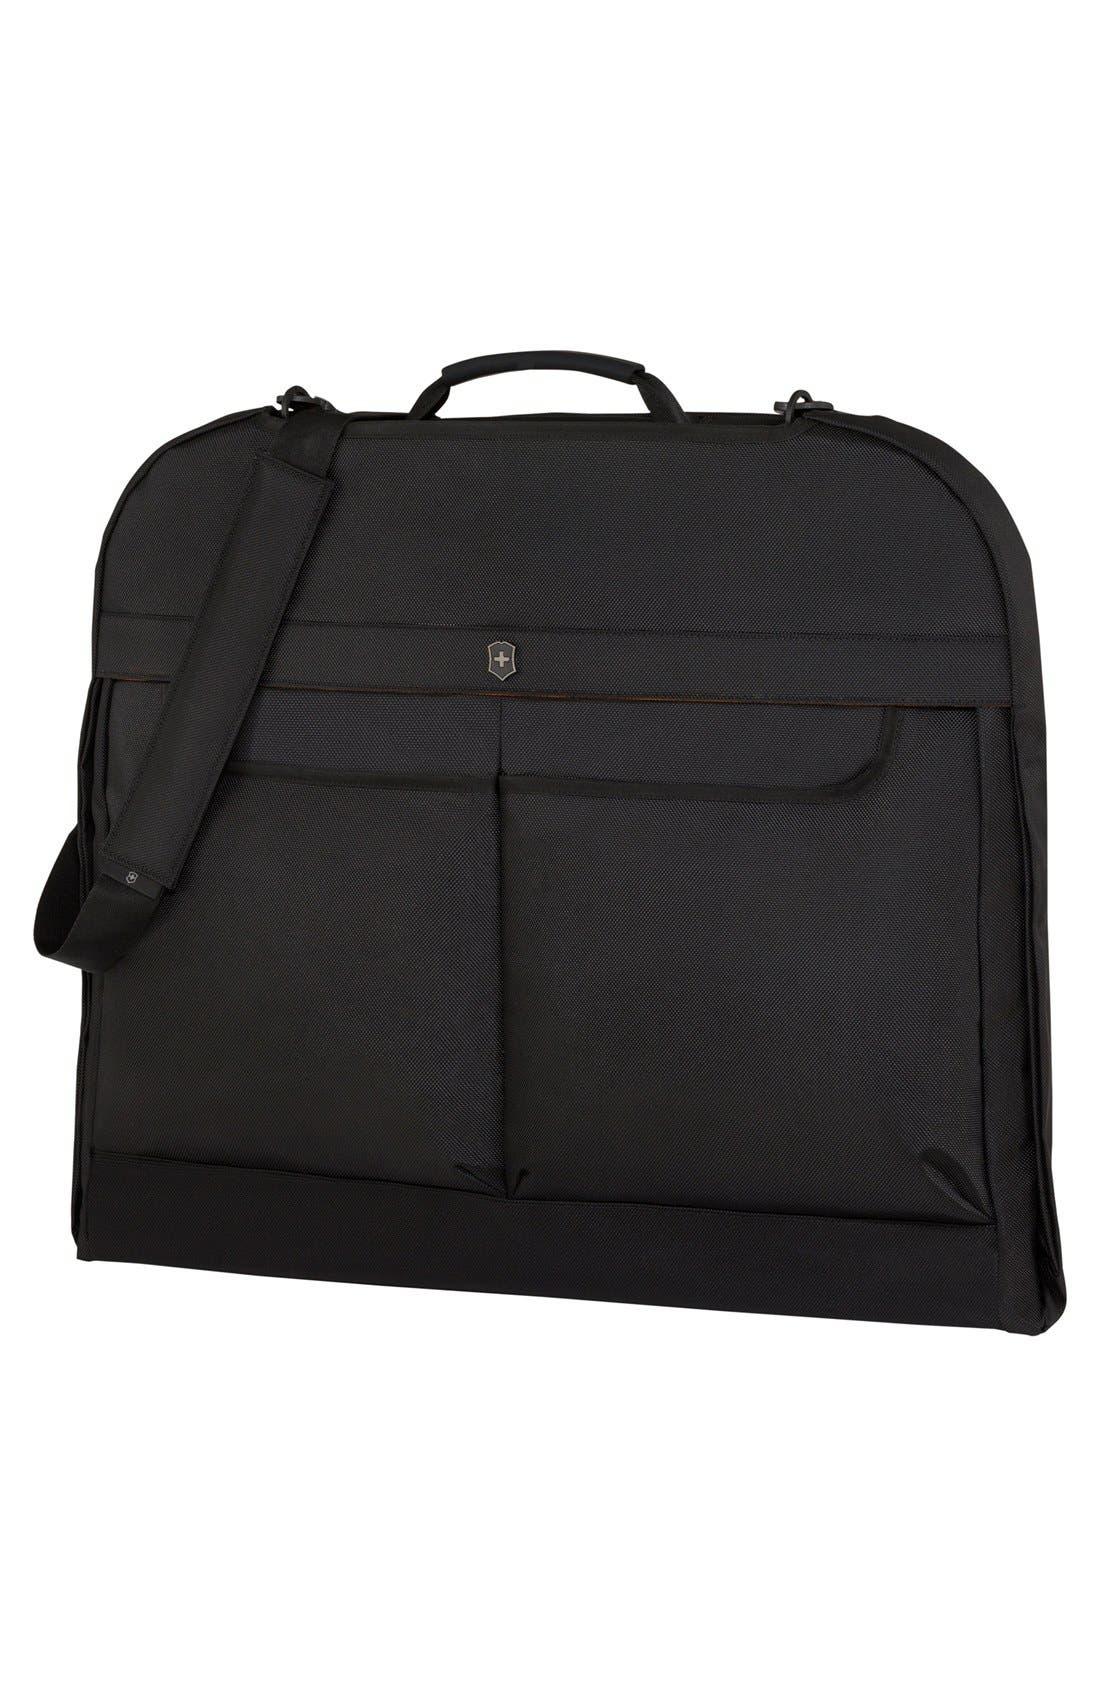 Alternate Image 1 Selected - Victorinox Swiss Army® WT 5.0 Deluxe Garment Bag